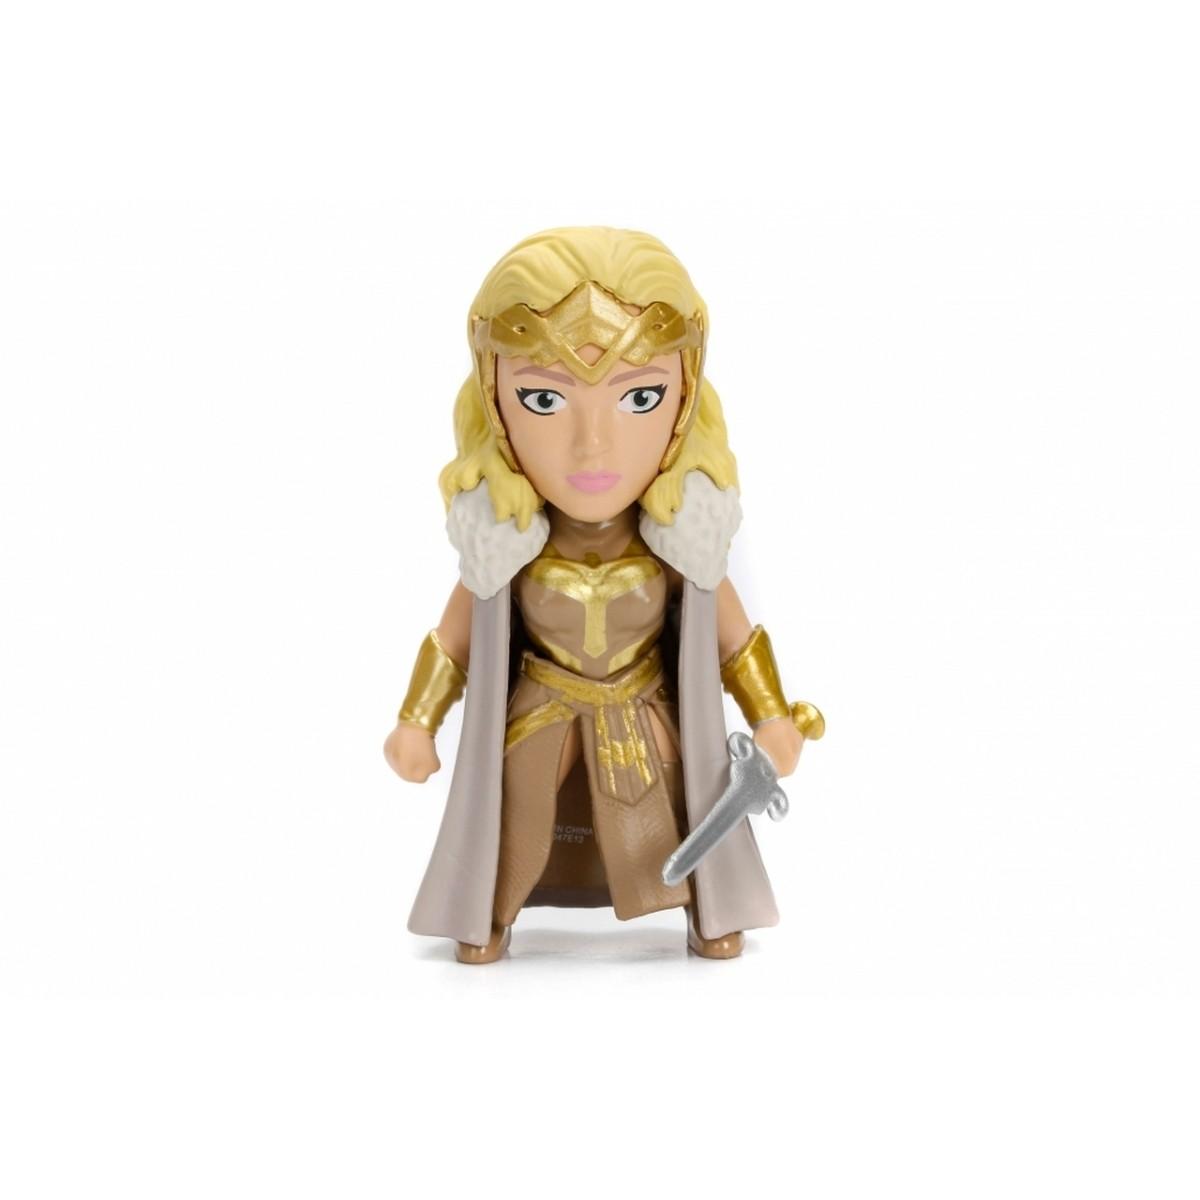 Metals Die Cast(Mini): Rainha Hippolyta: Mulher Maravilha (Wonder Woman) (M284)